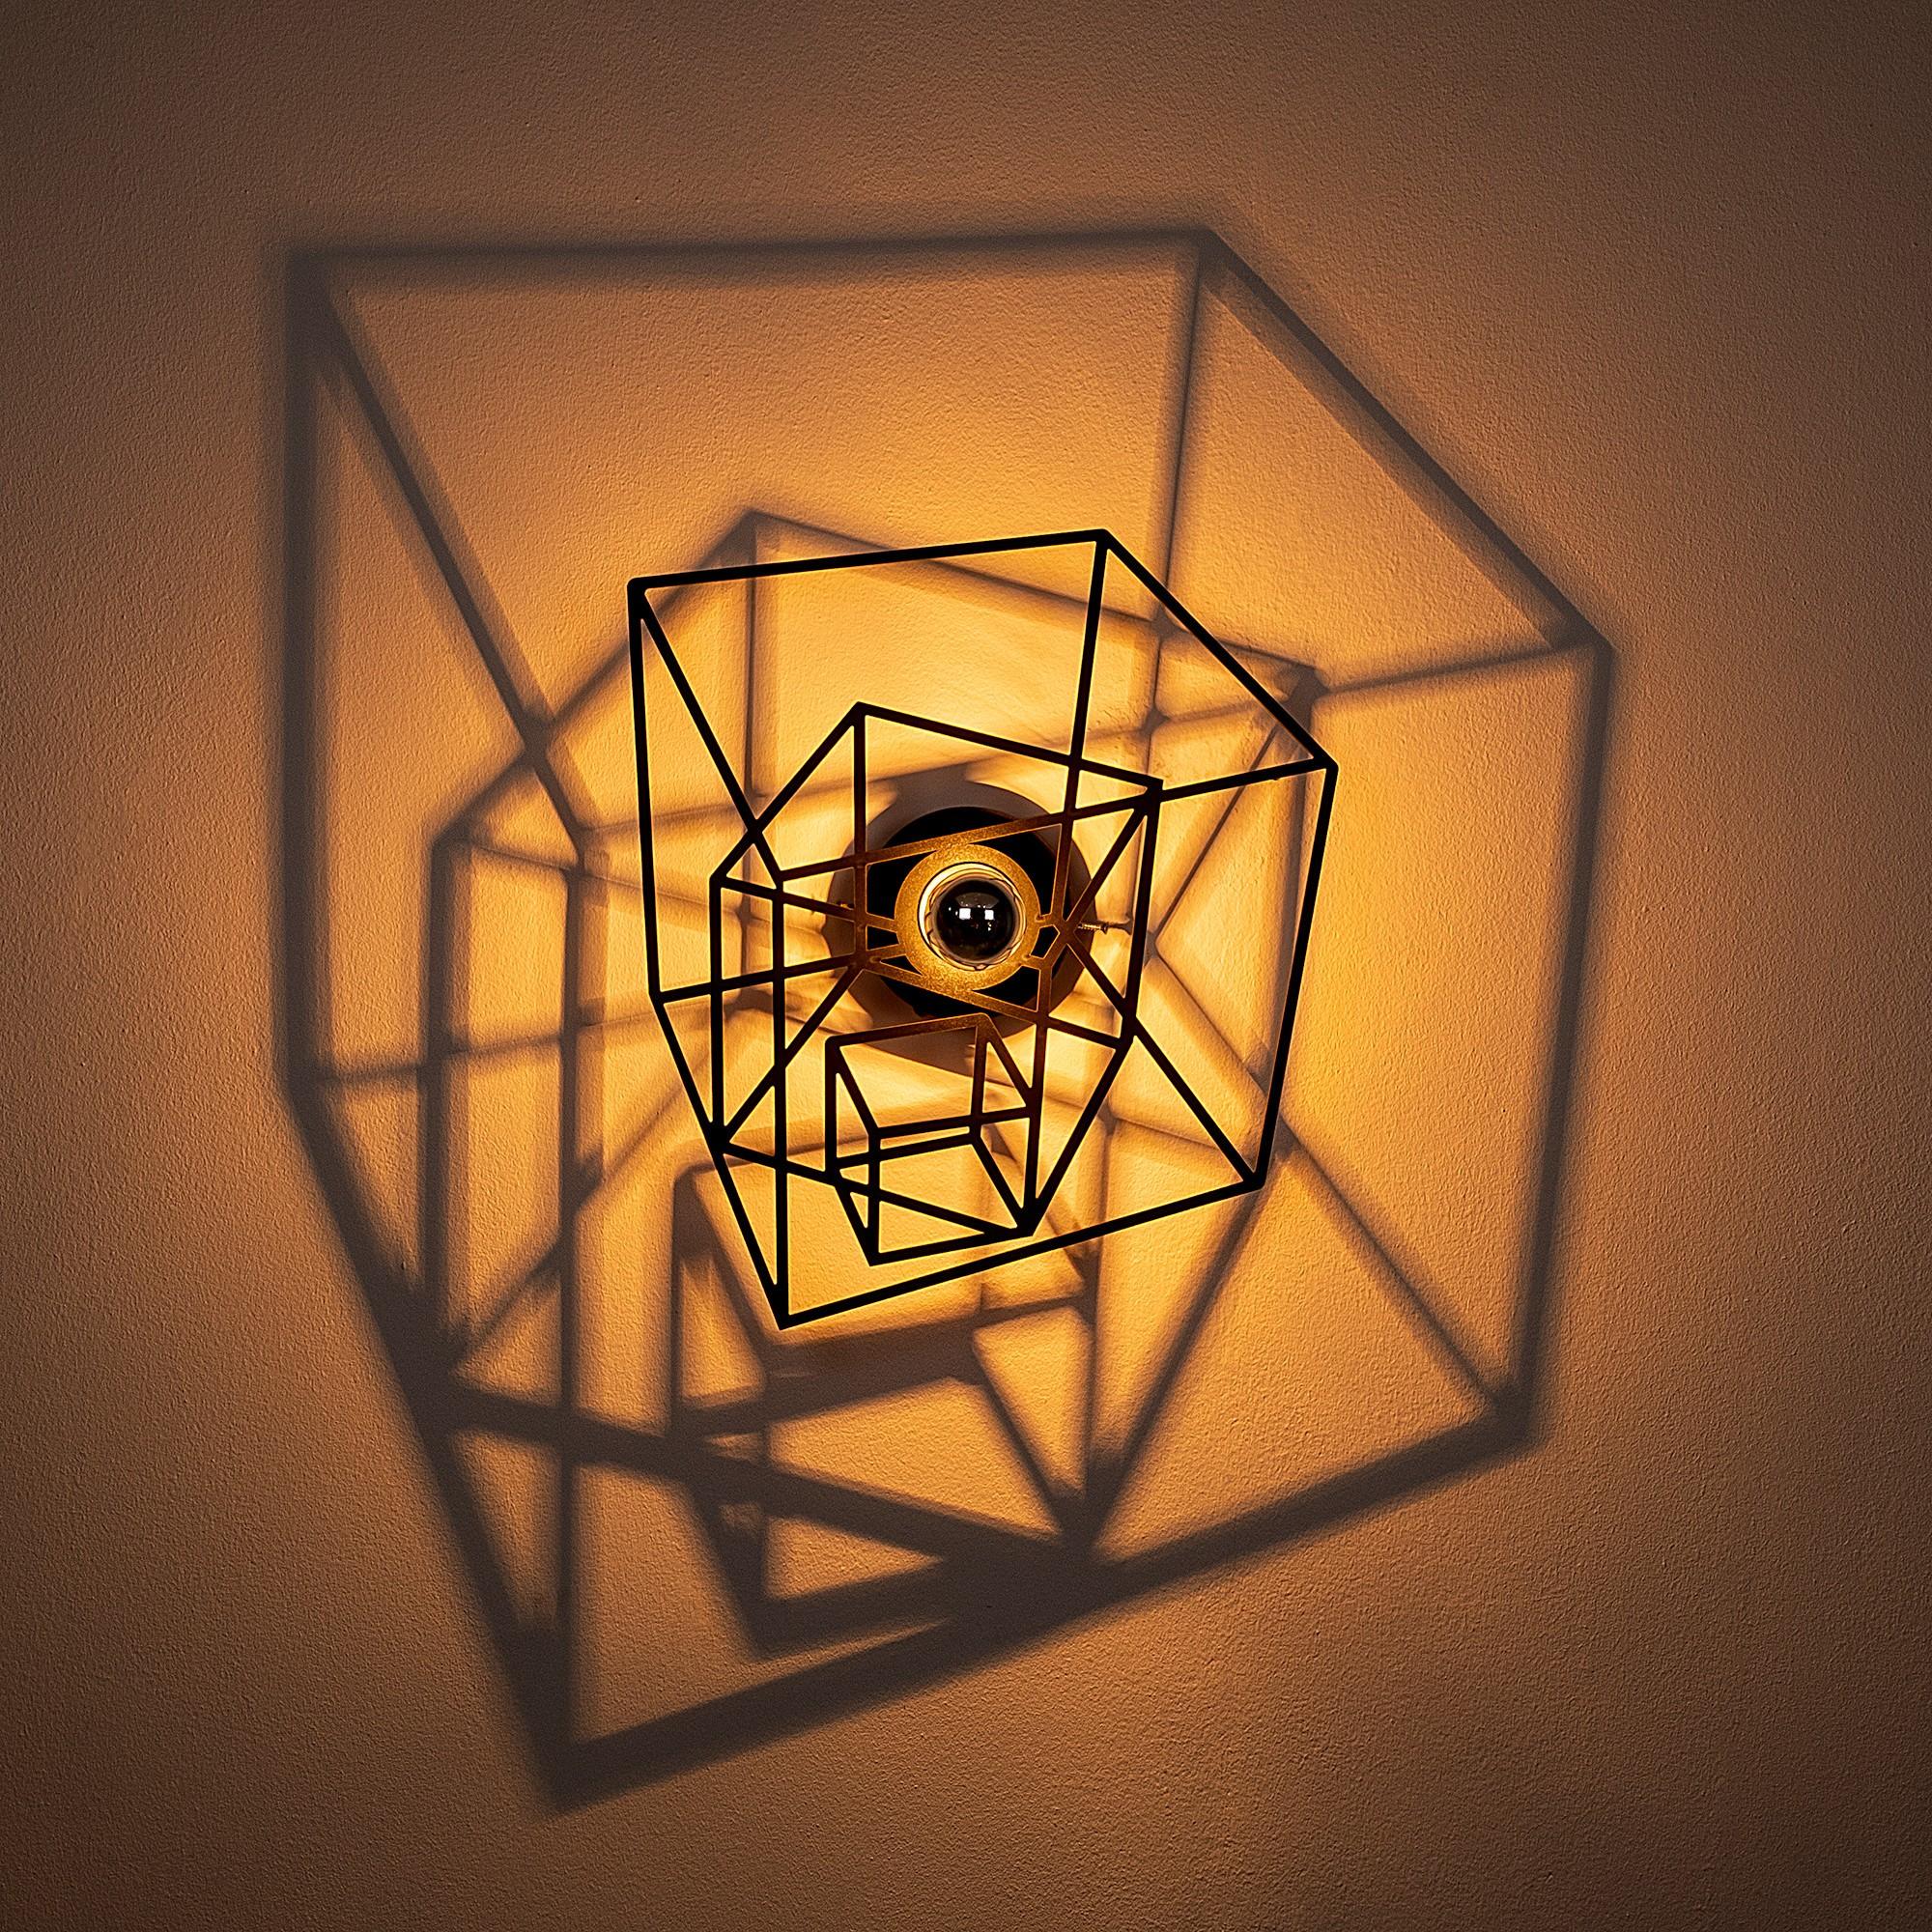 LED industriële wanddeco lamp - Kubus - dimbaar - E27 fitting - sfeerfoto incl. lamp